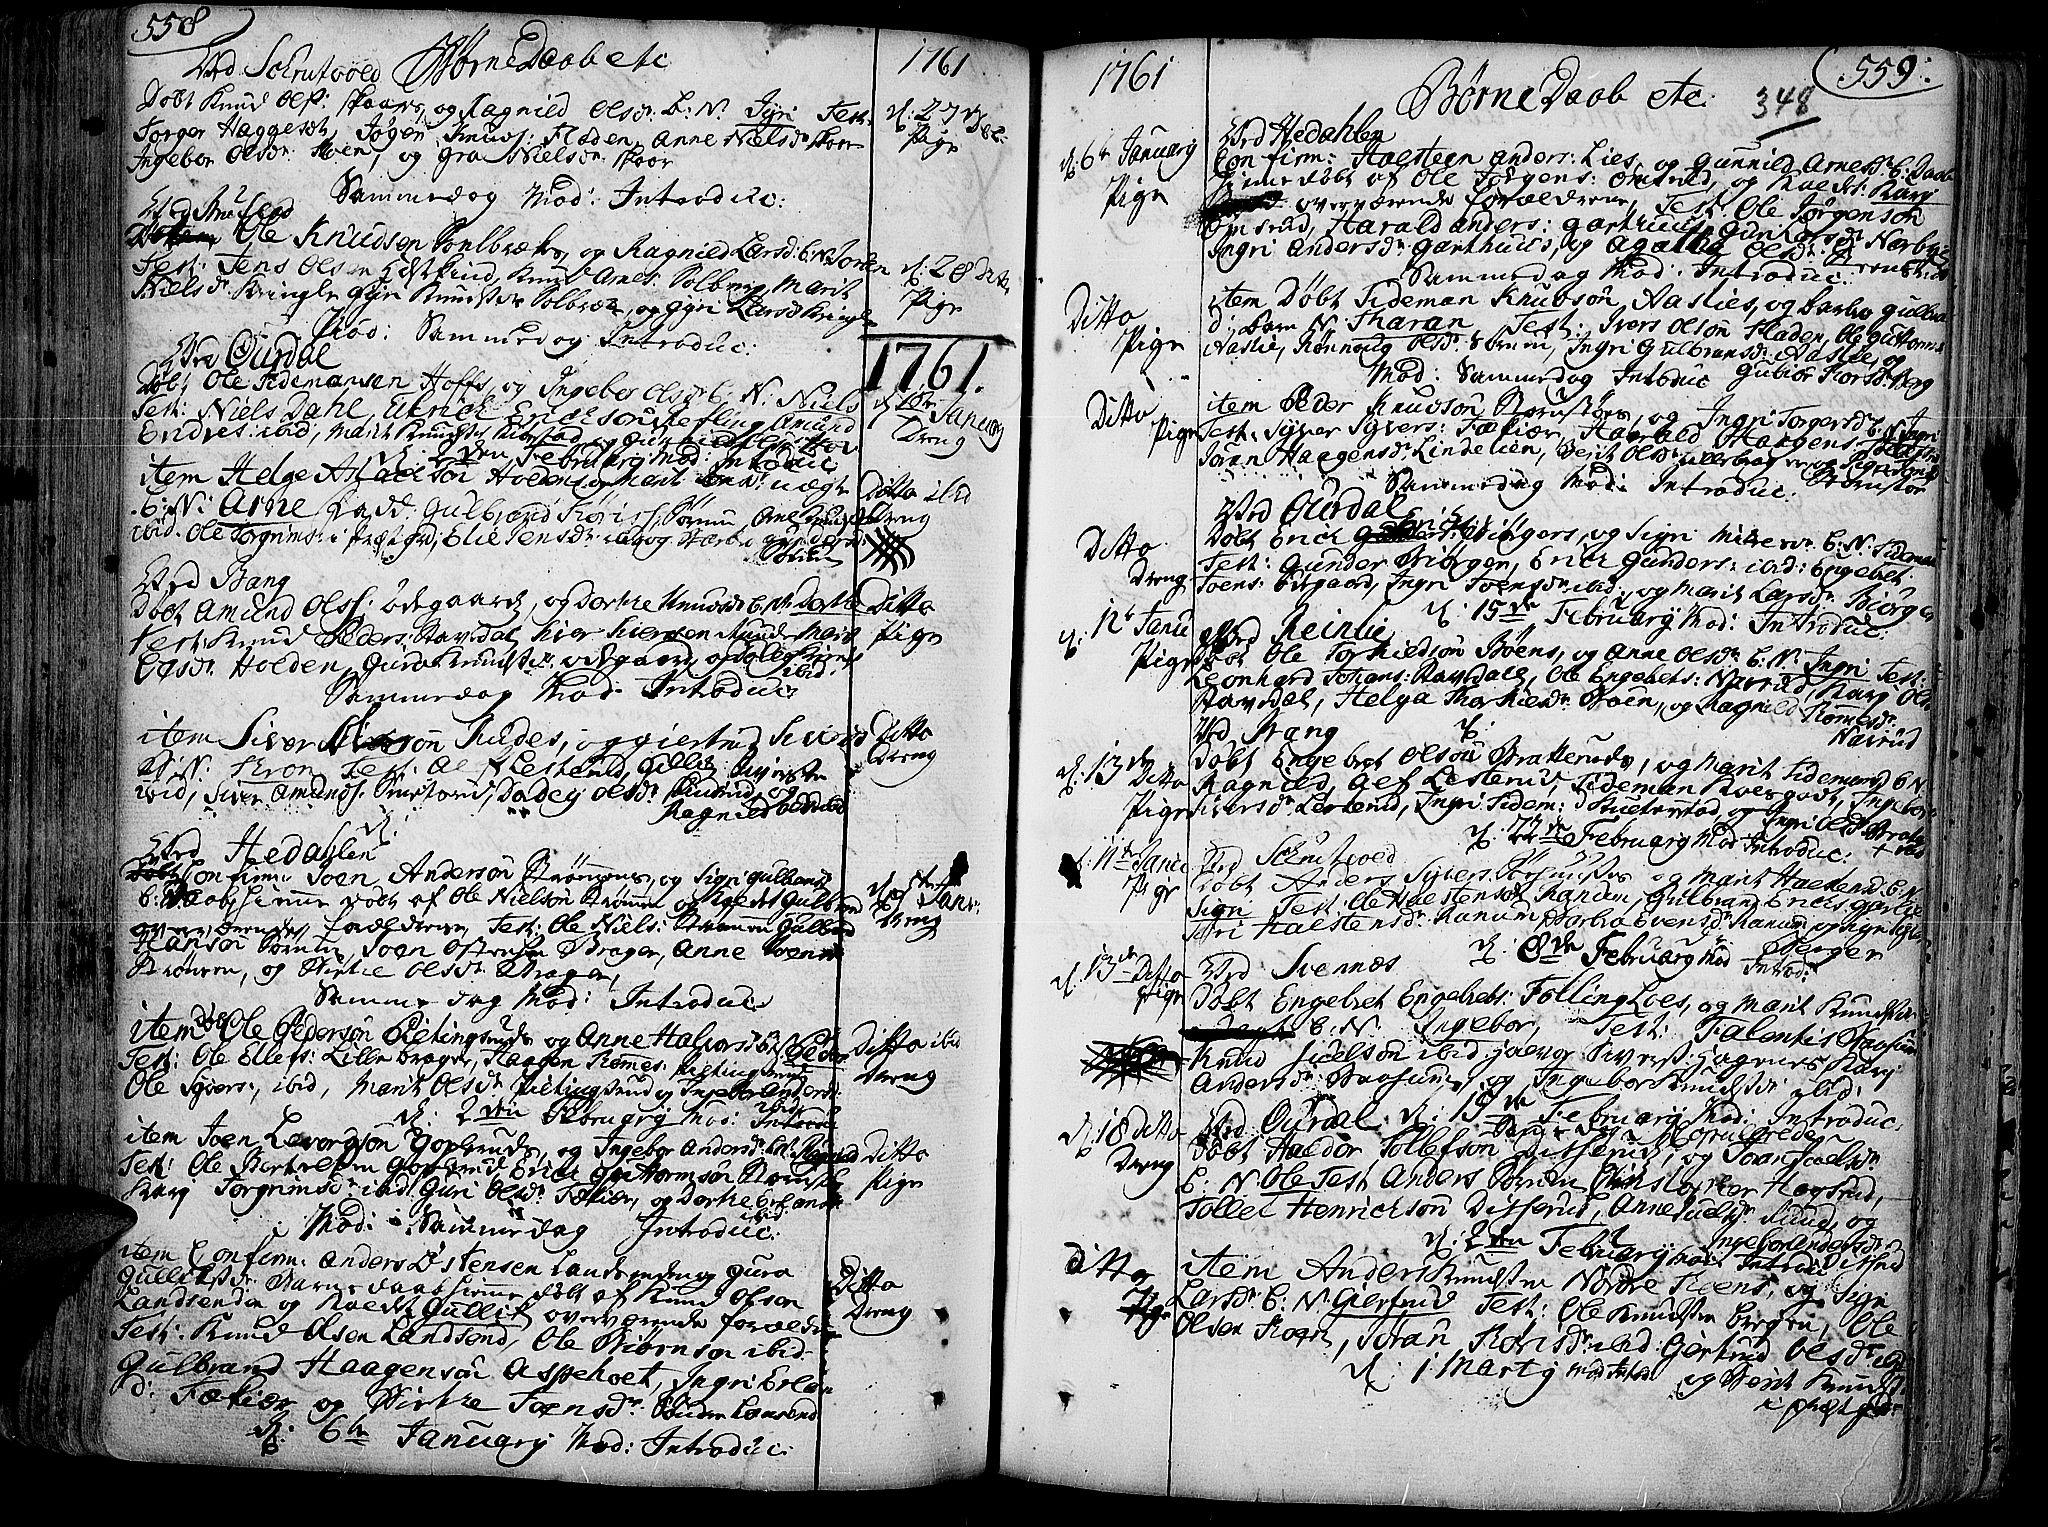 SAH, Aurdal prestekontor, Ministerialbok nr. 4, 1730-1762, s. 558-559